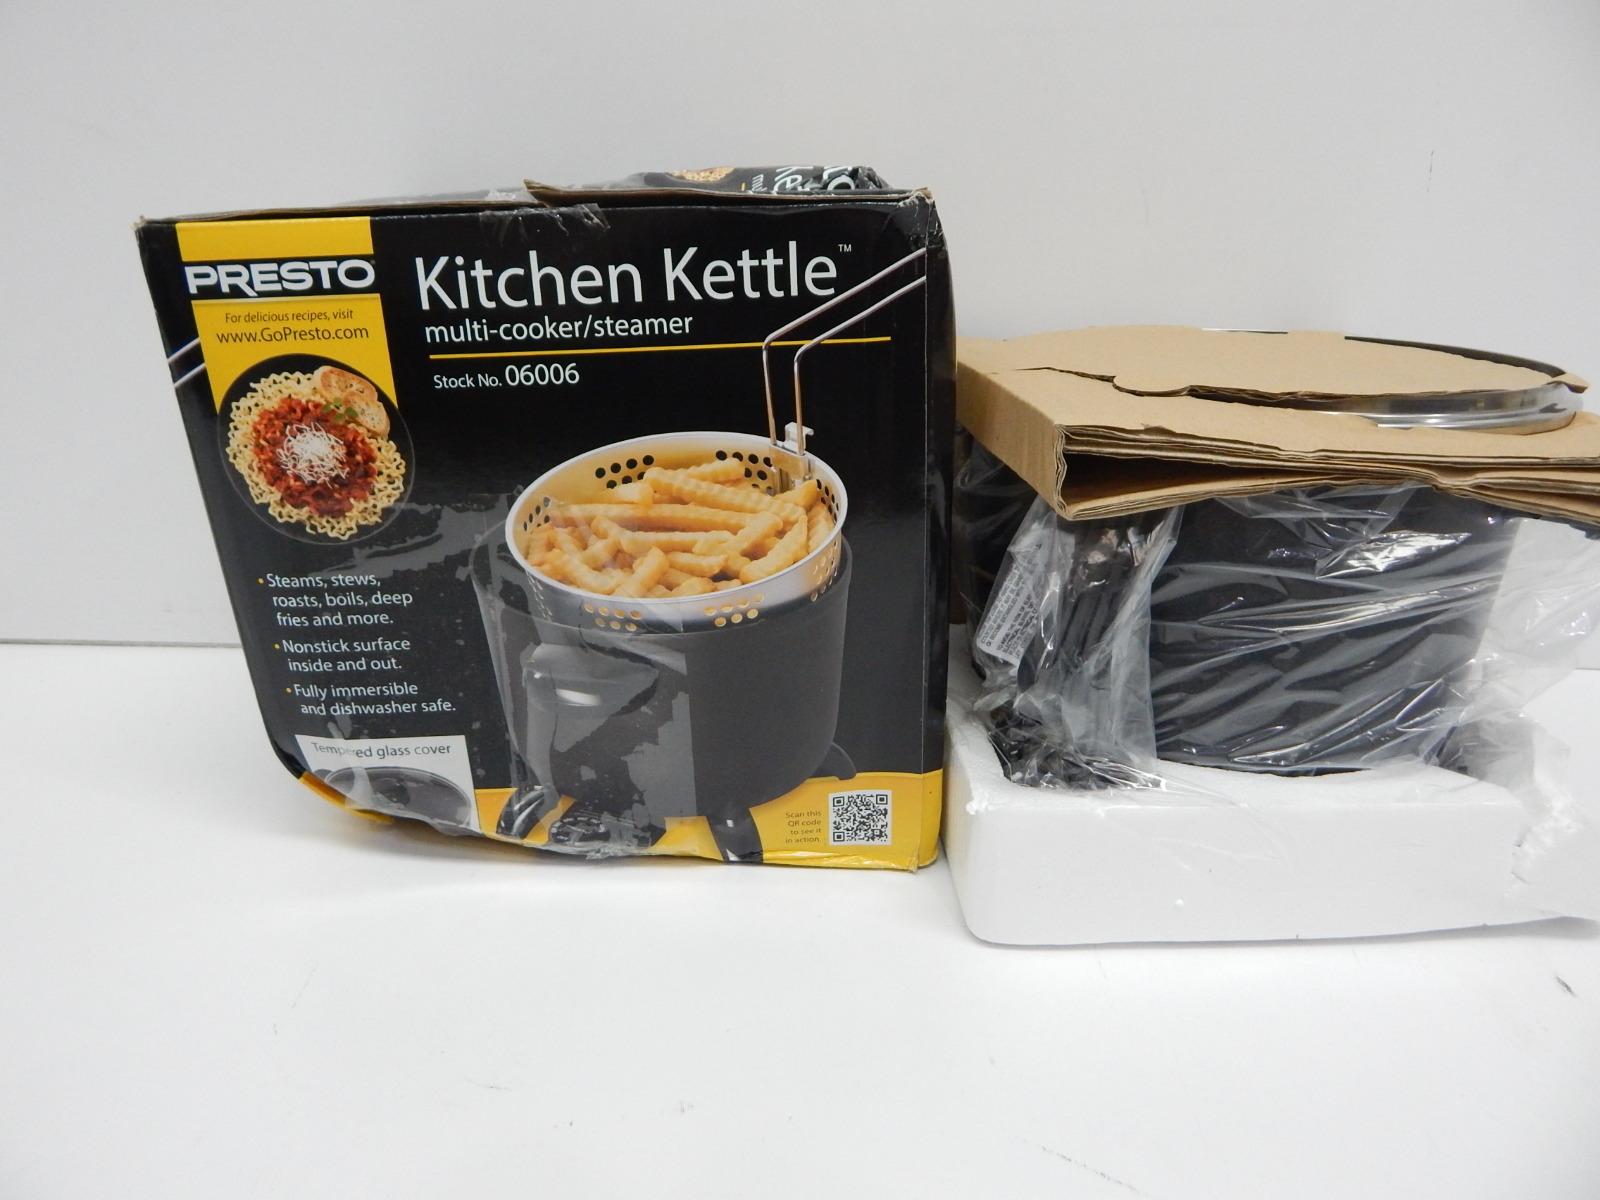 Presto 06006 Kitchen Kettle Multi Cooker Steamer Manual